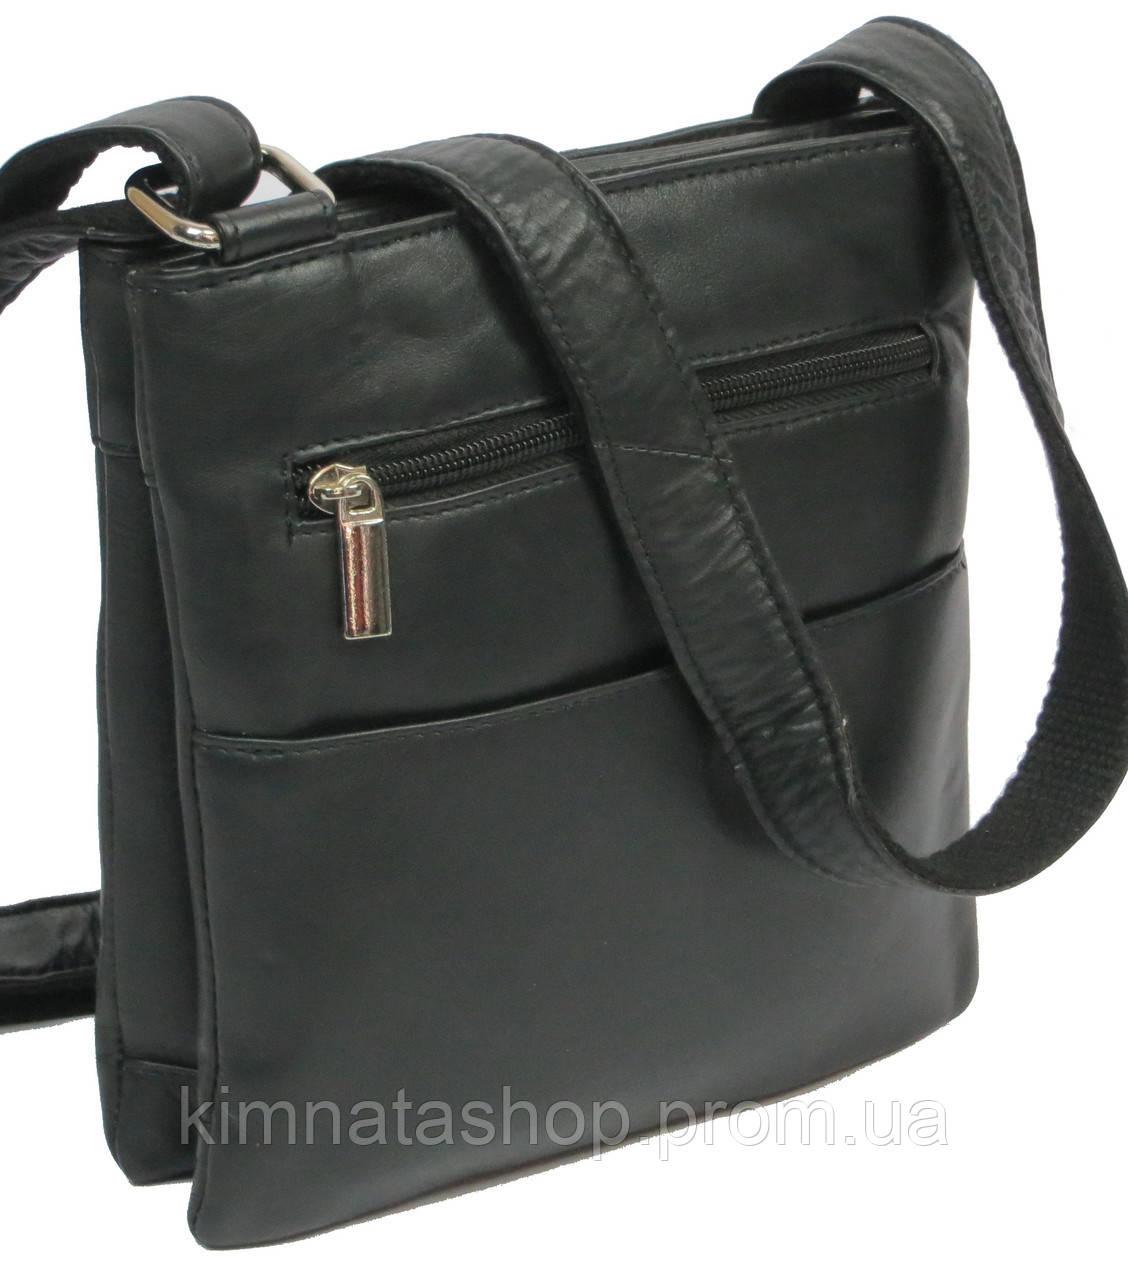 e811a070f245 Мужская кожаная сумка для документов Always wild 108-1-spn 20х20х6 см.